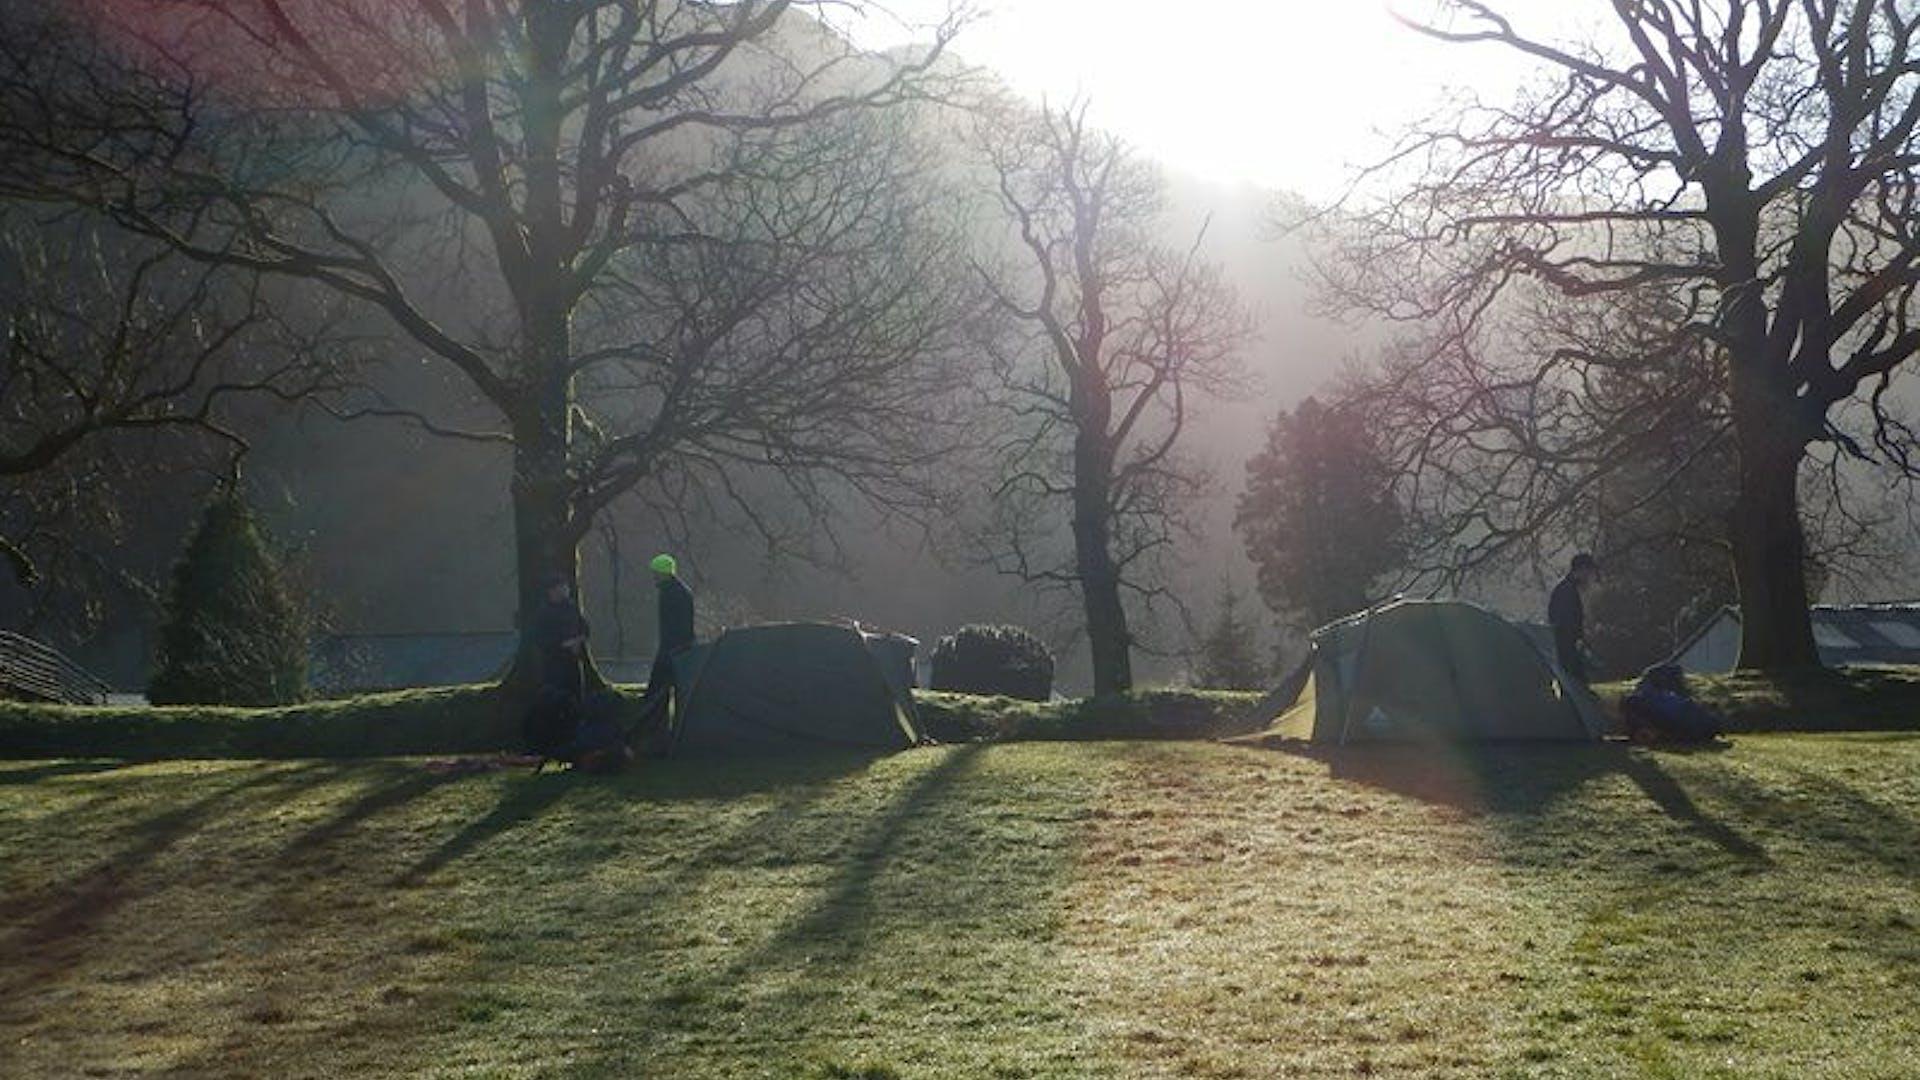 Myles Ripley Sedbergh School dawn scene Seathwaite Lake District 1